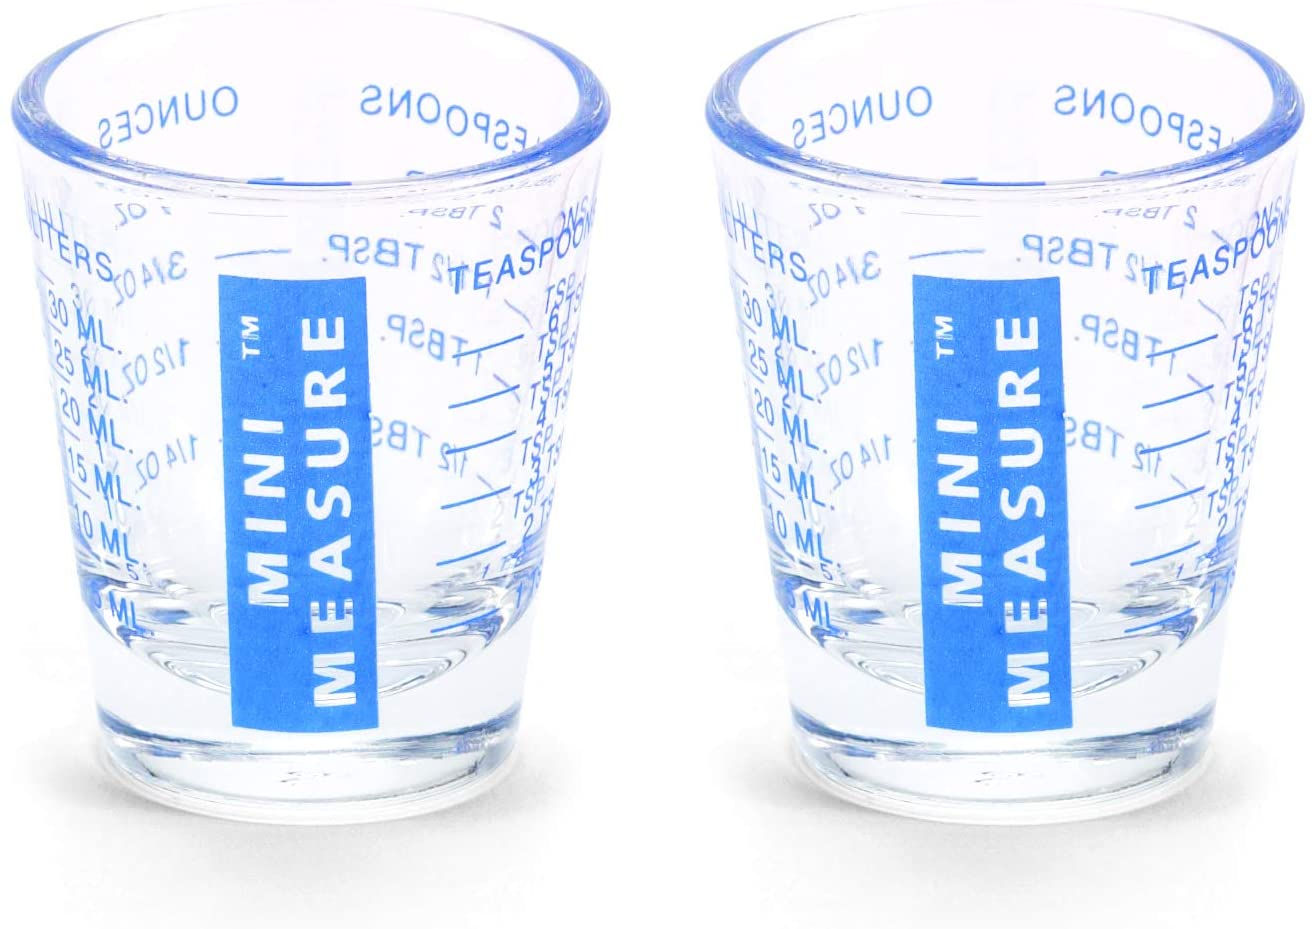 Kolder Mini Measure Heavy Glass, 20-Incremental Measurements Multi-Purpose Liquid and Dry Measuring Shot Glass, Blue, Set of 2